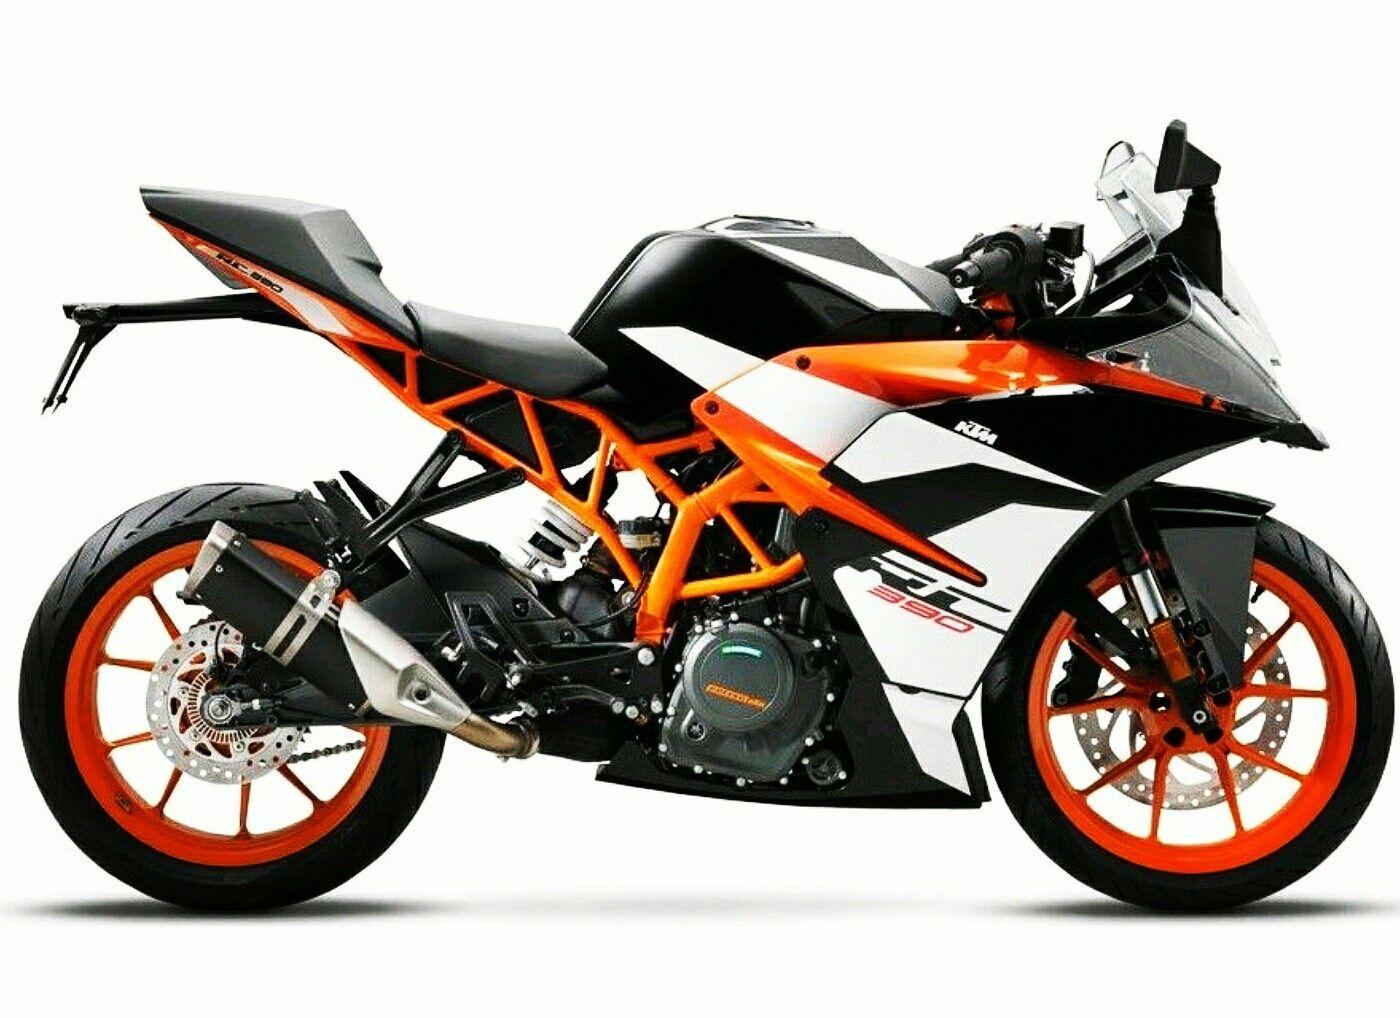 Ktm Rc 390 2017 Ktm Rc Ktm Motorcycles Ktm Ktm rc 390 hd wallpaper download 2018